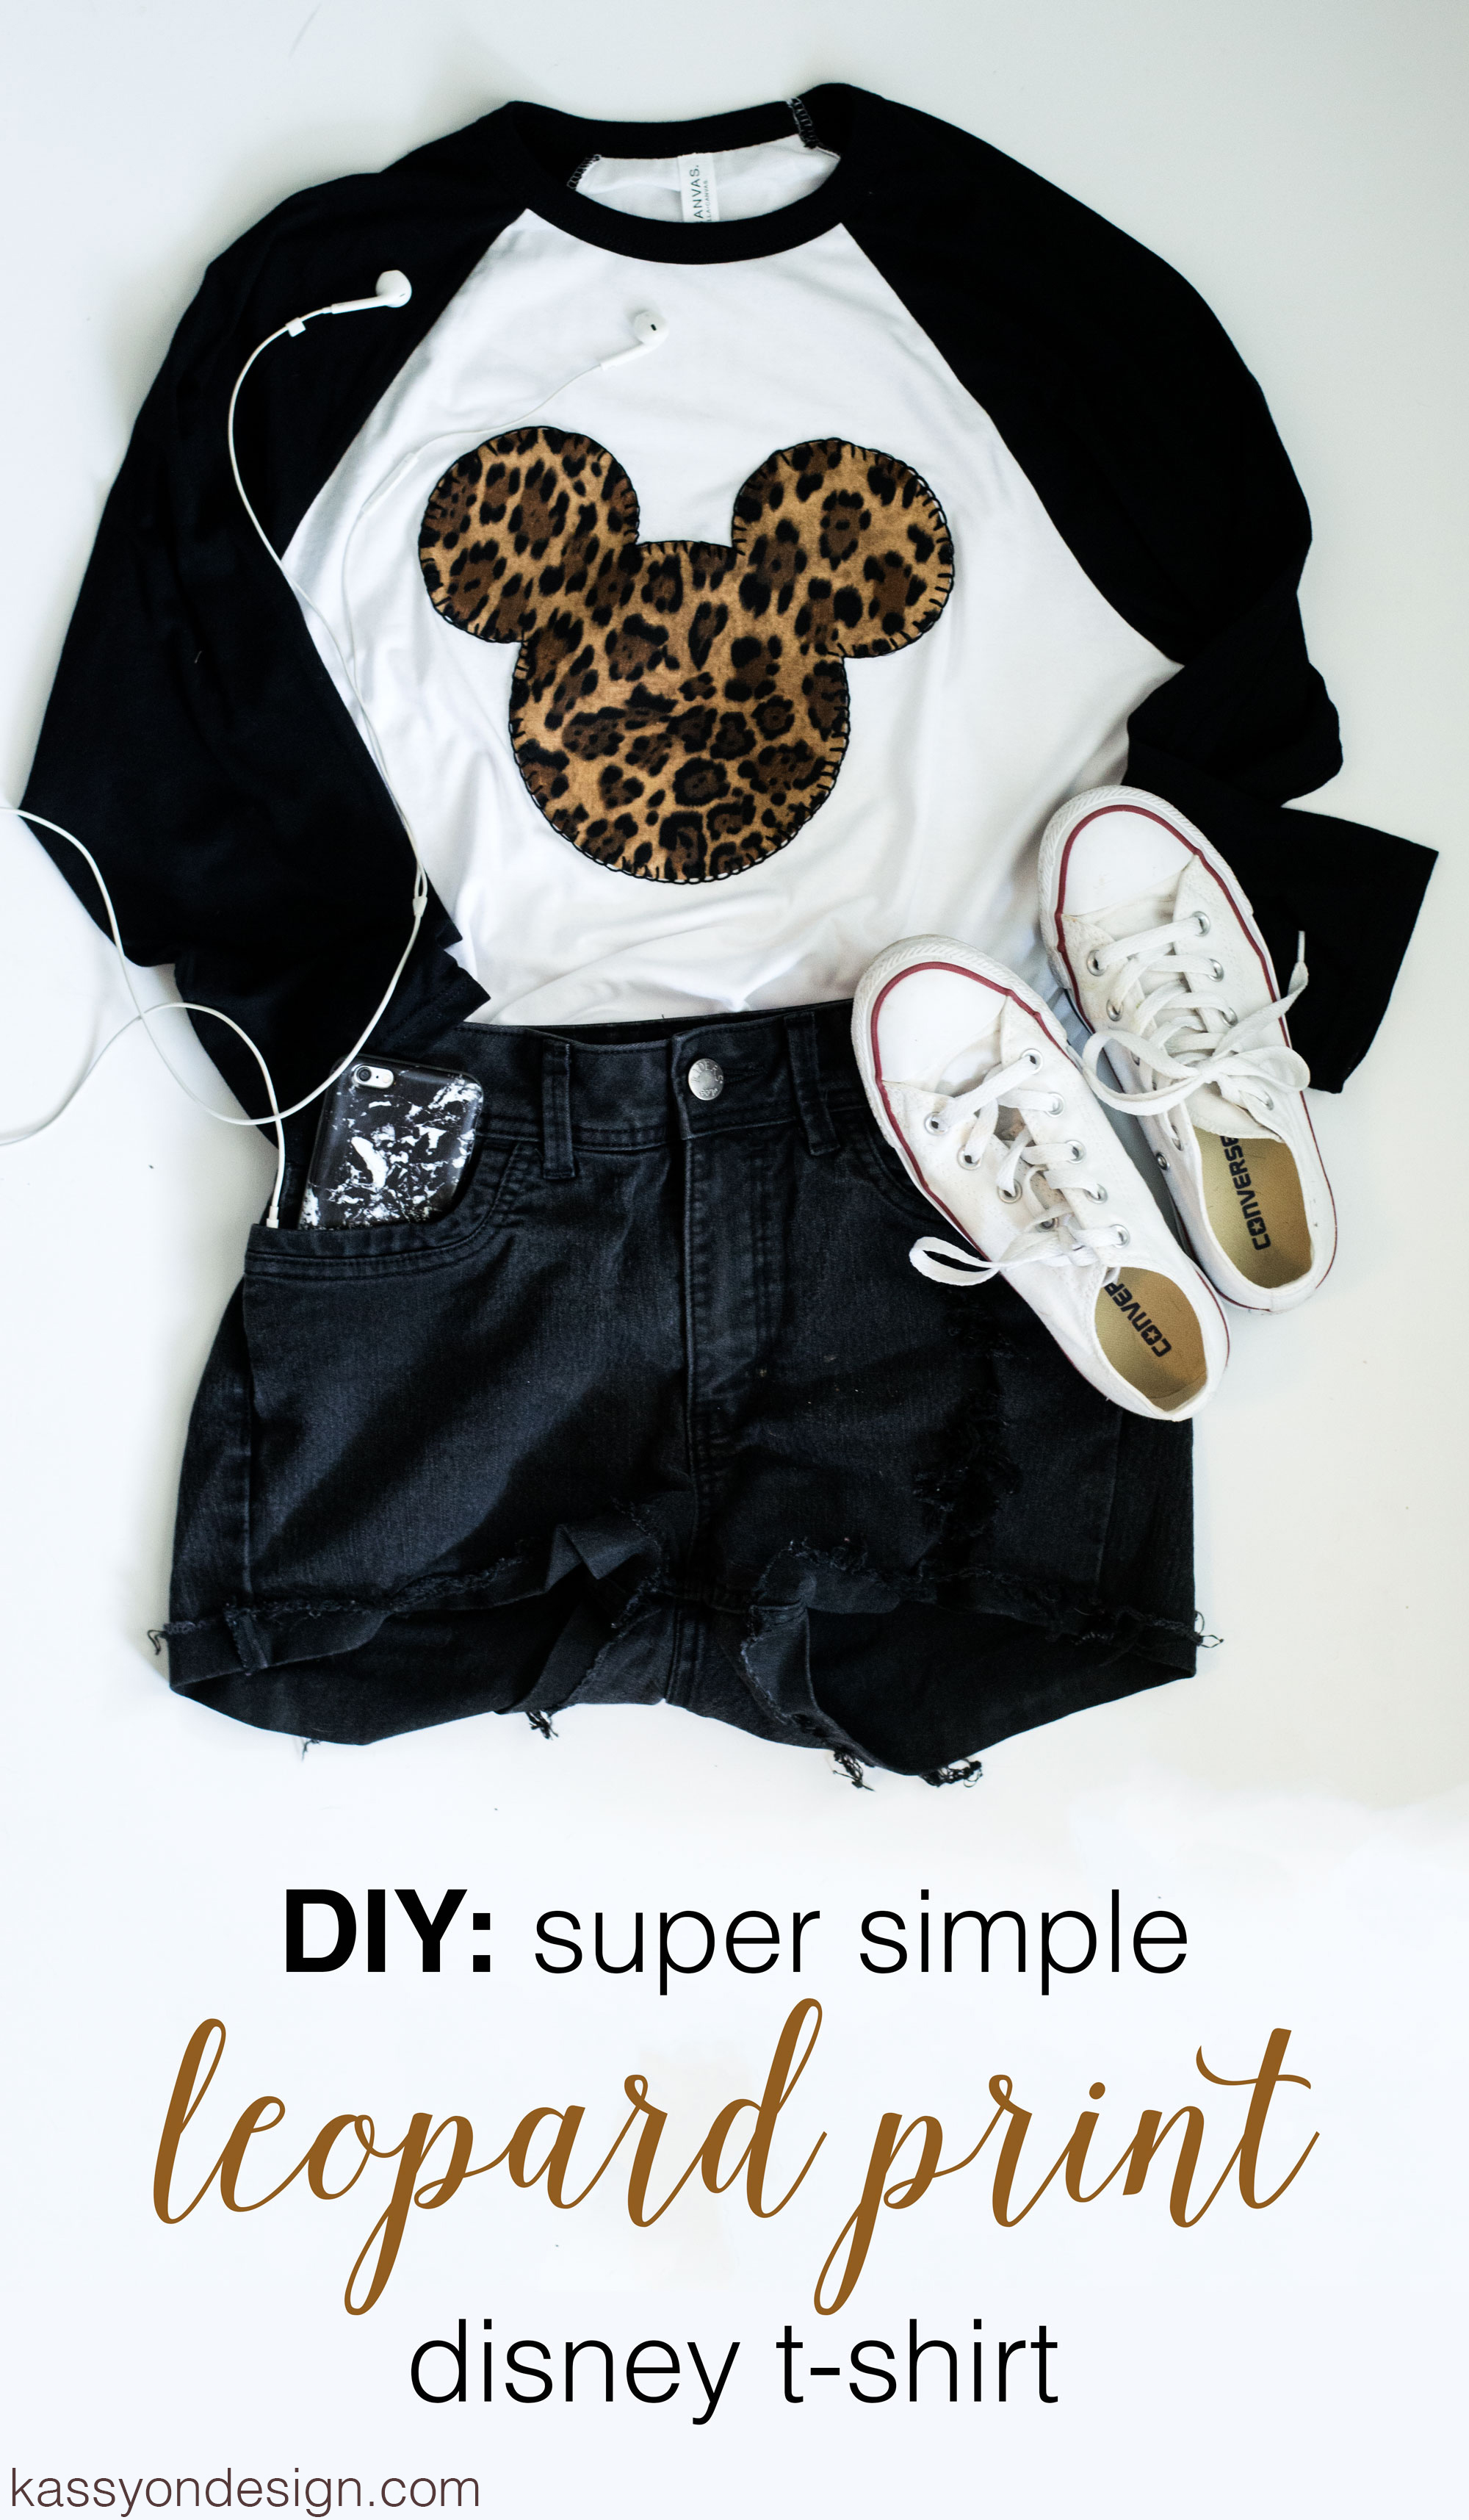 Disney diy leopard print mickey shirt kassy on design for Shirt printing places near me